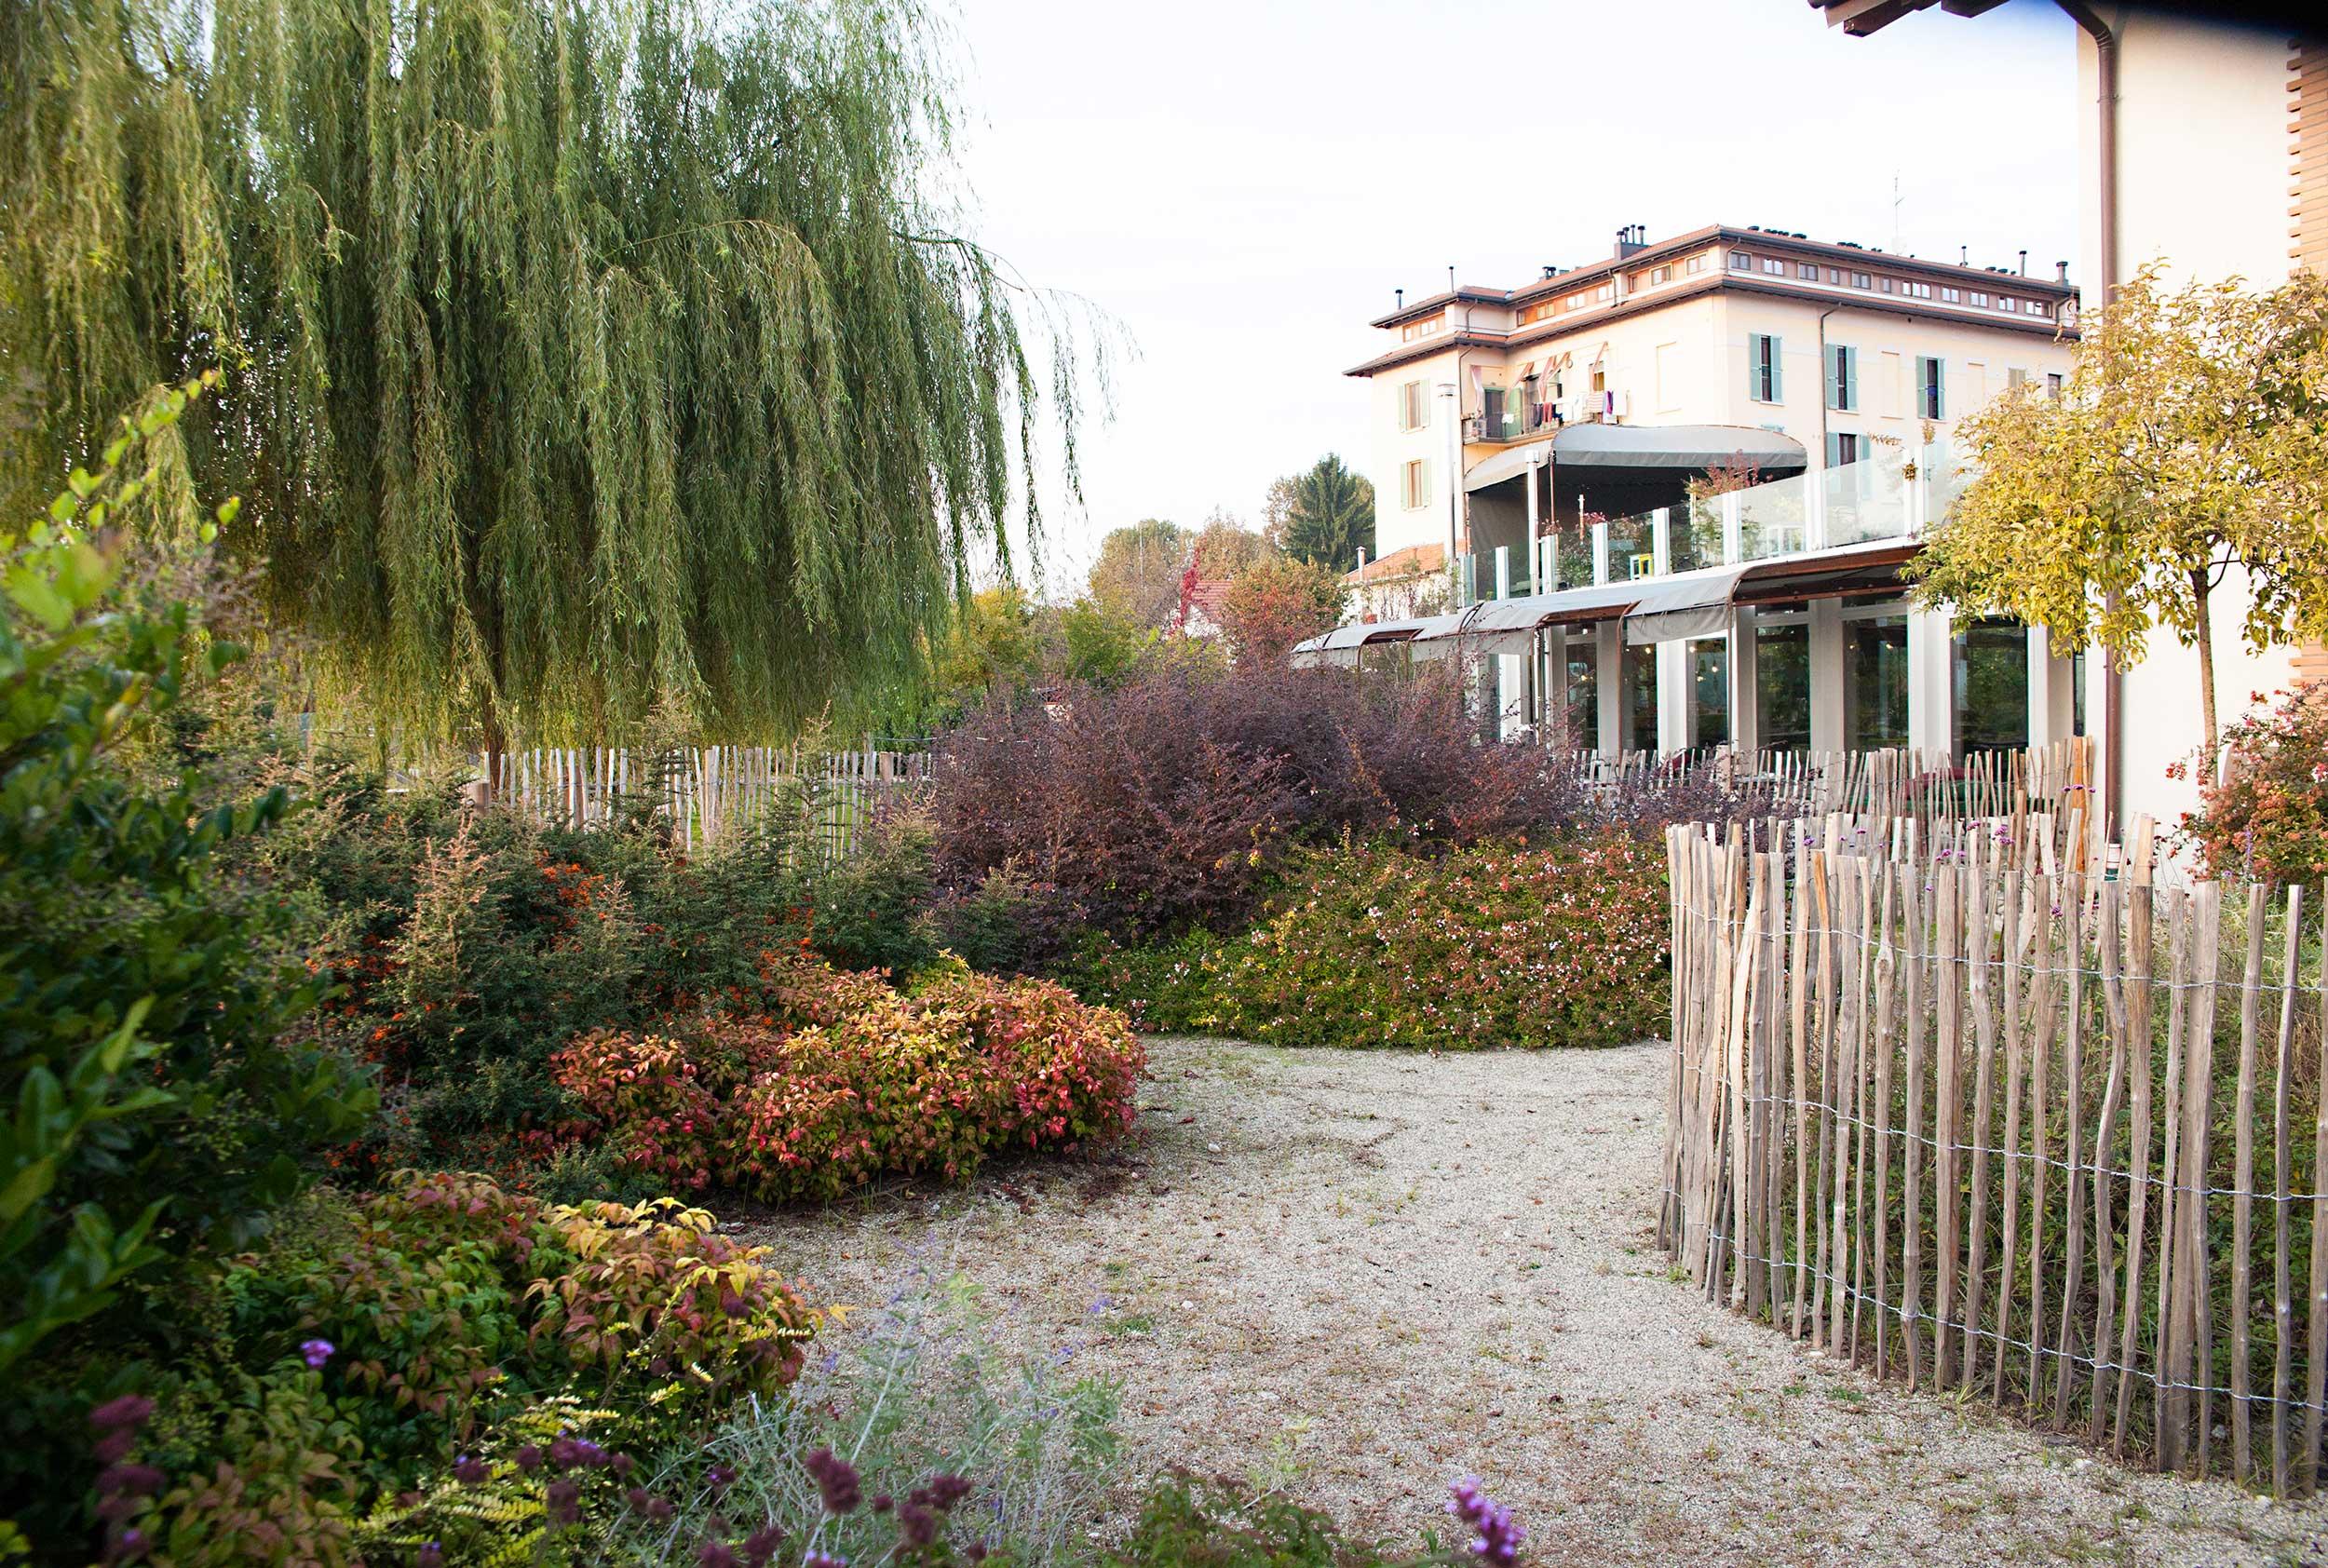 giardino con piante e fiori a Milano